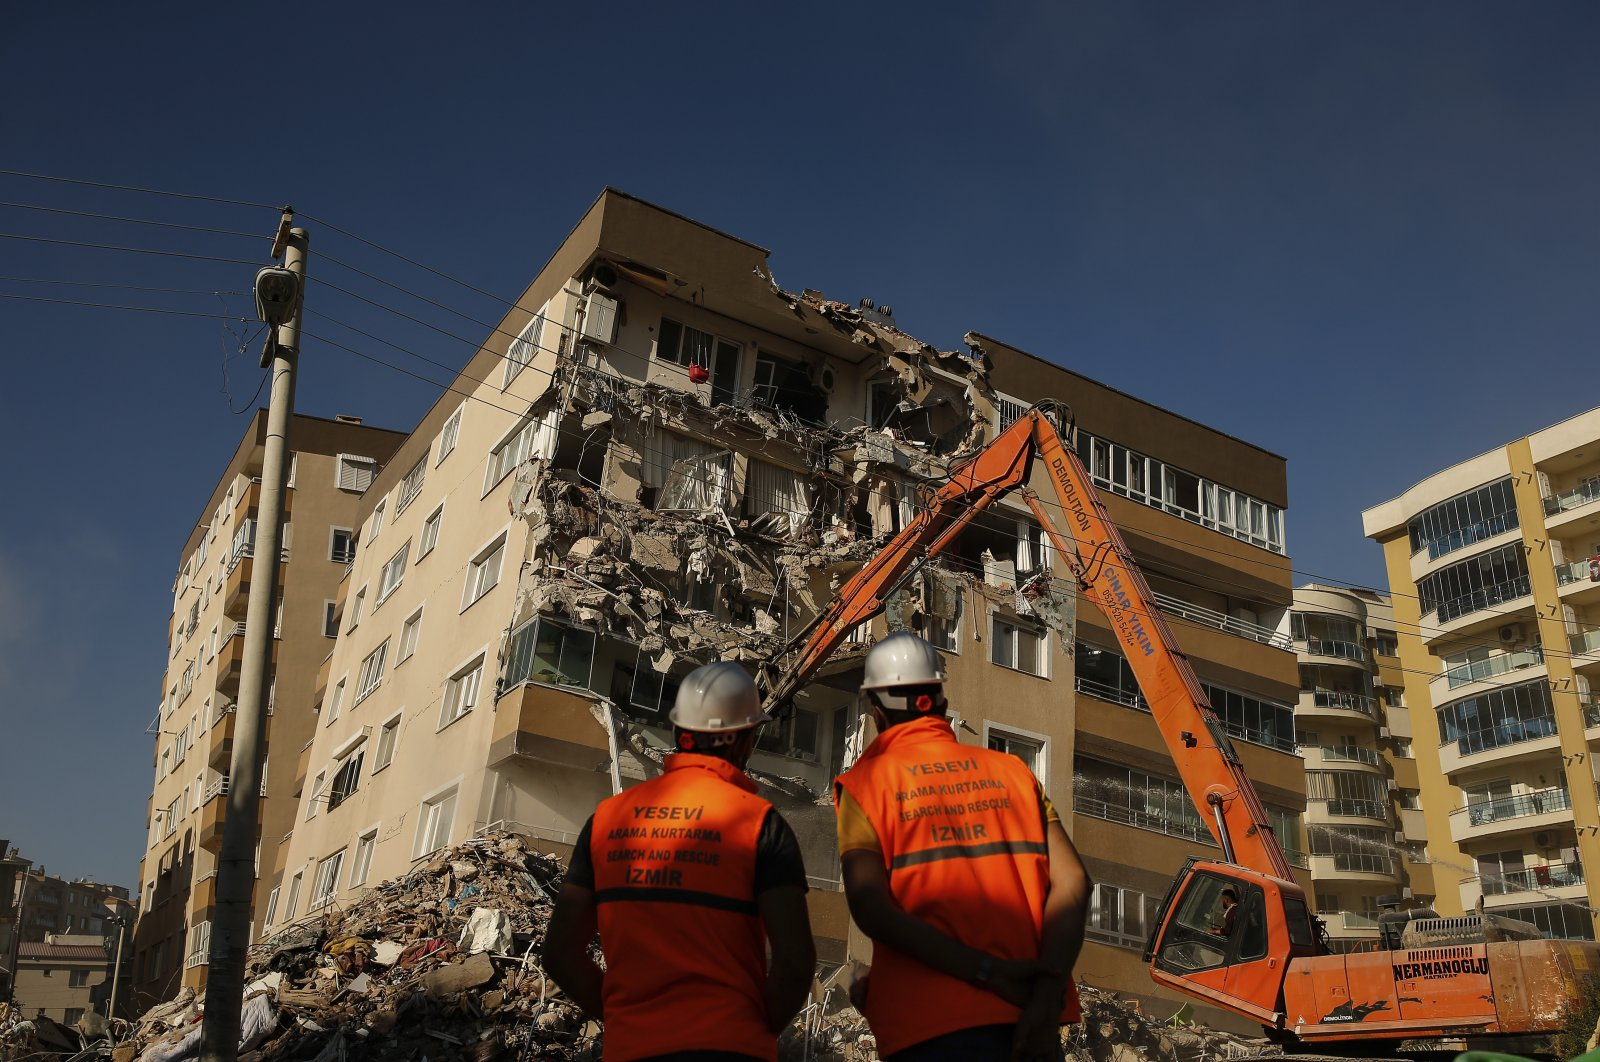 Workers watch as a bulldozer demolishes a damaged building in Izmir, western Turkey, Nov. 4, 2020. (AP Photo)